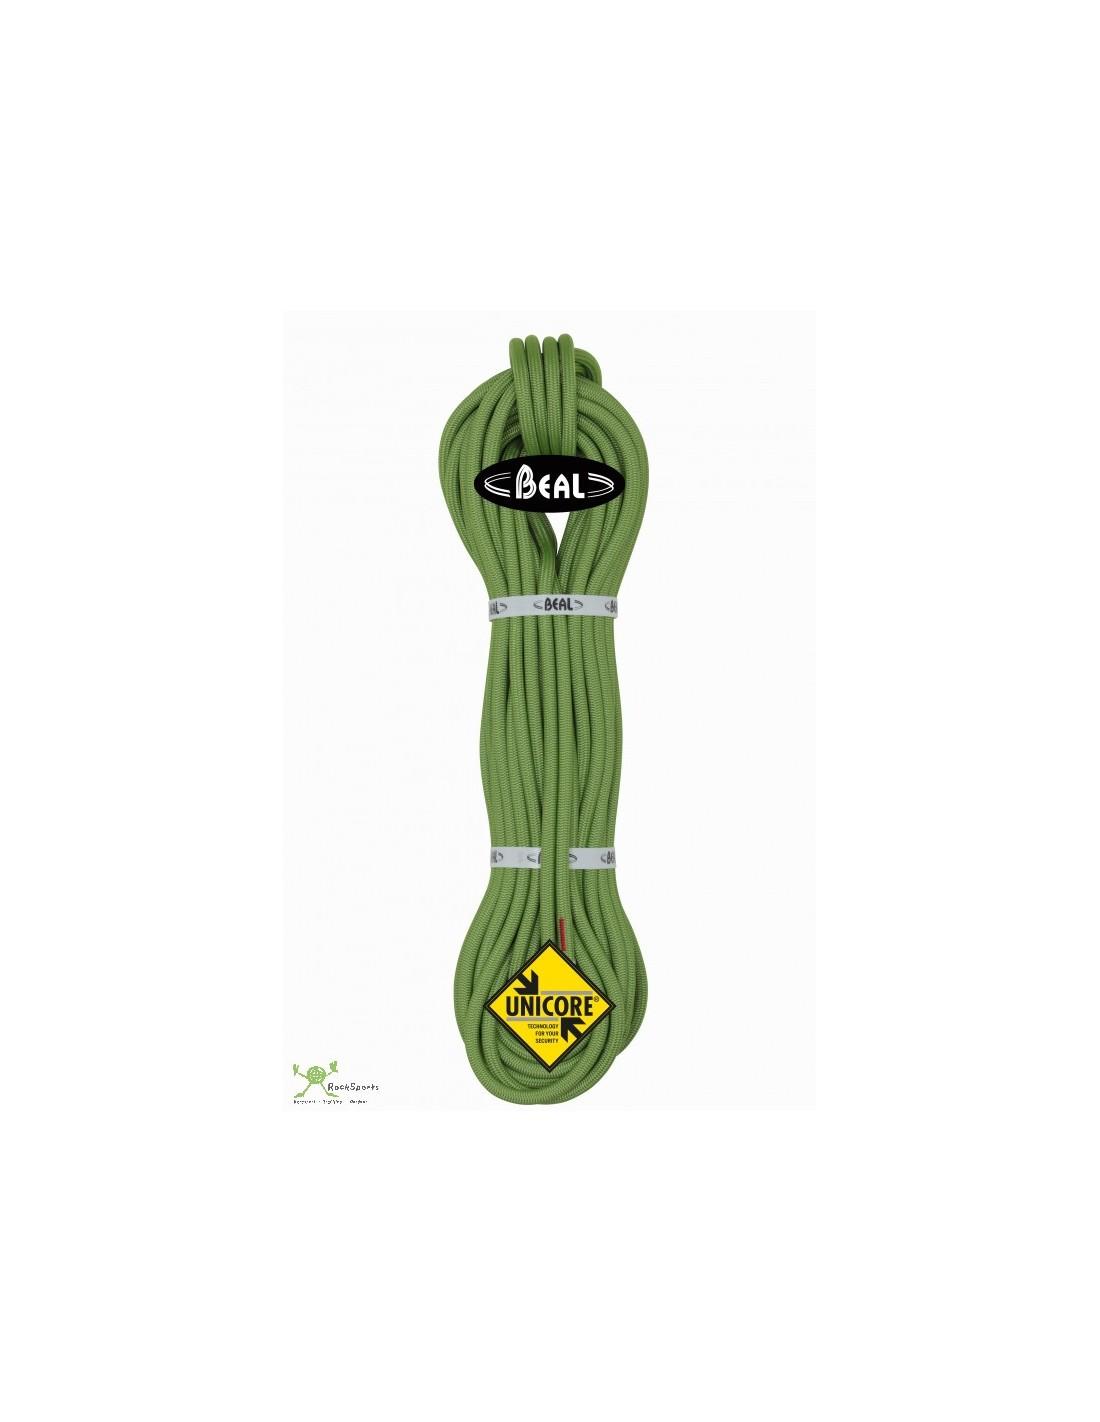 Beal Kletterseil 10,2 mm Wall School Unicore, grün, 20 m Seildurchmesser - 10.1